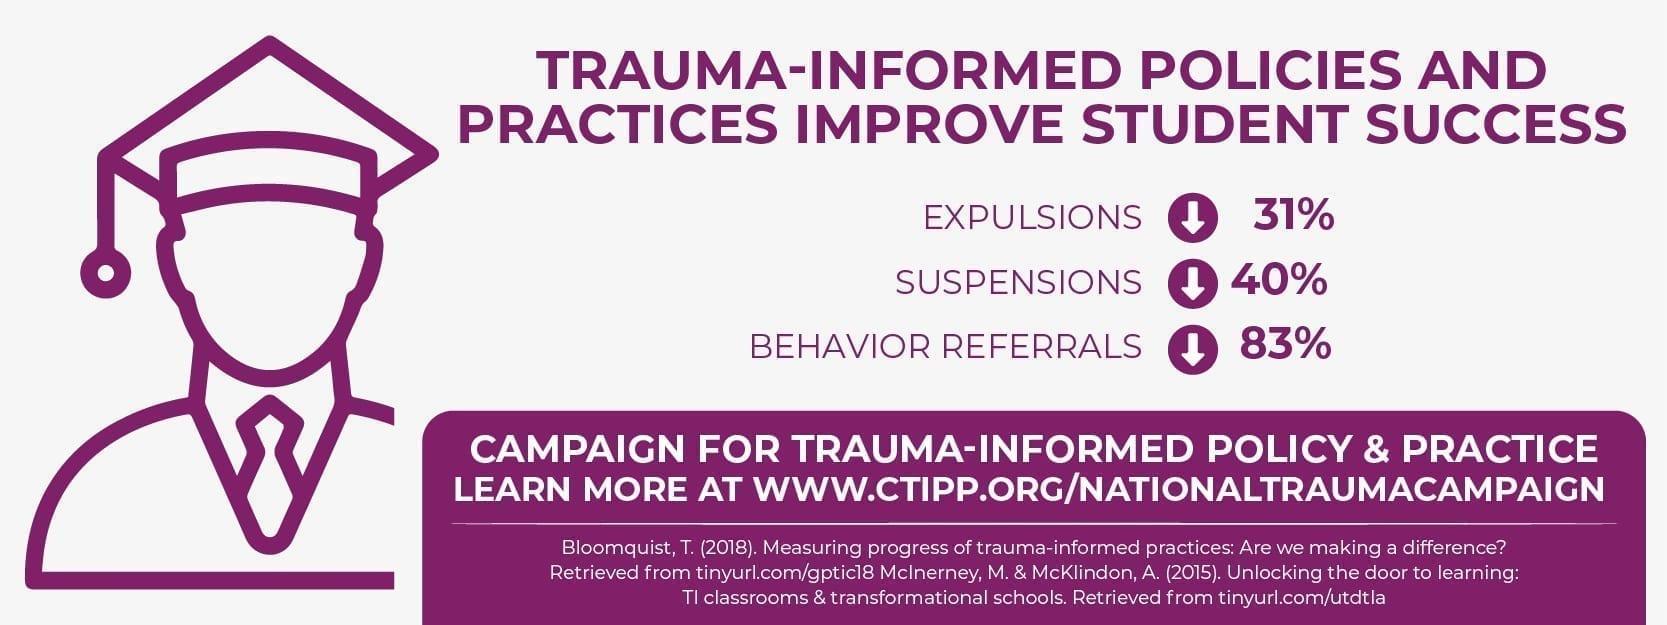 Trauma-Informed Policies